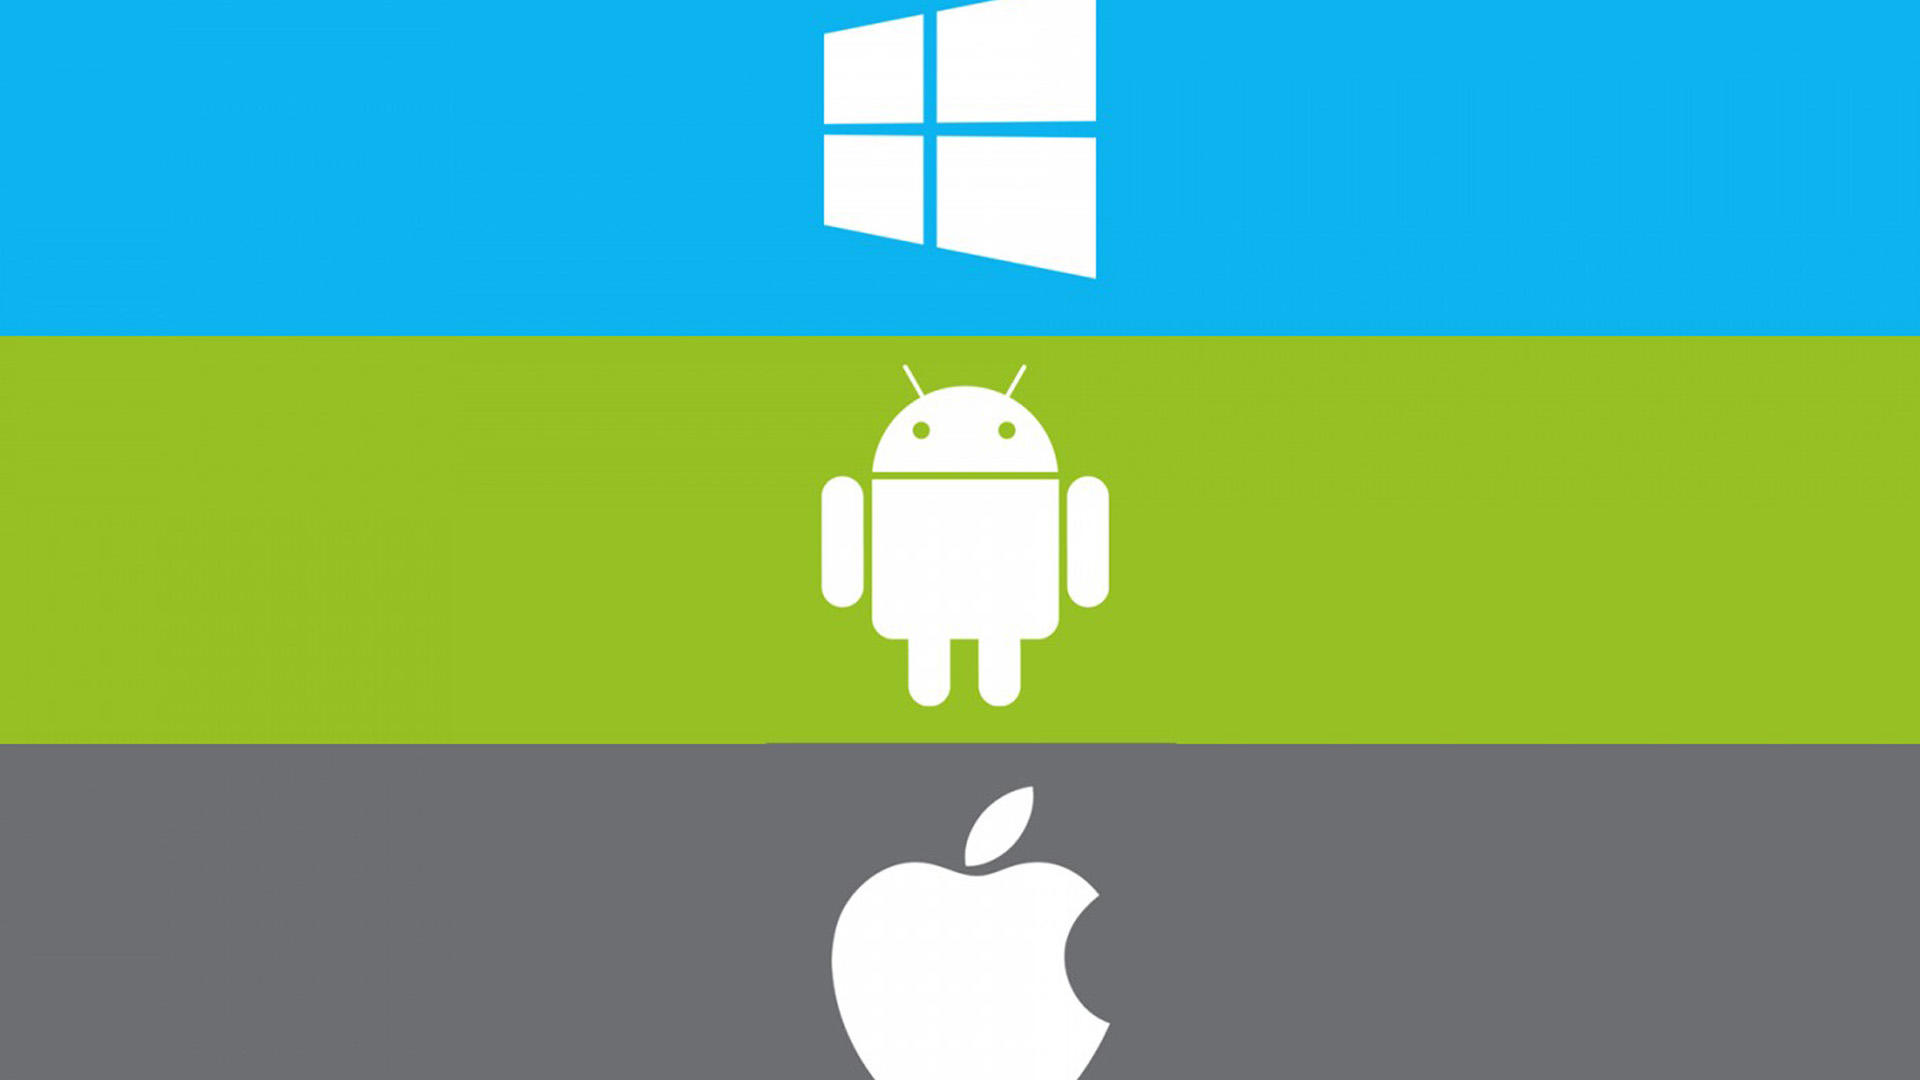 COMPUTER PLUS CELLPHONE - COMPUTER+CELLPHONE image 2